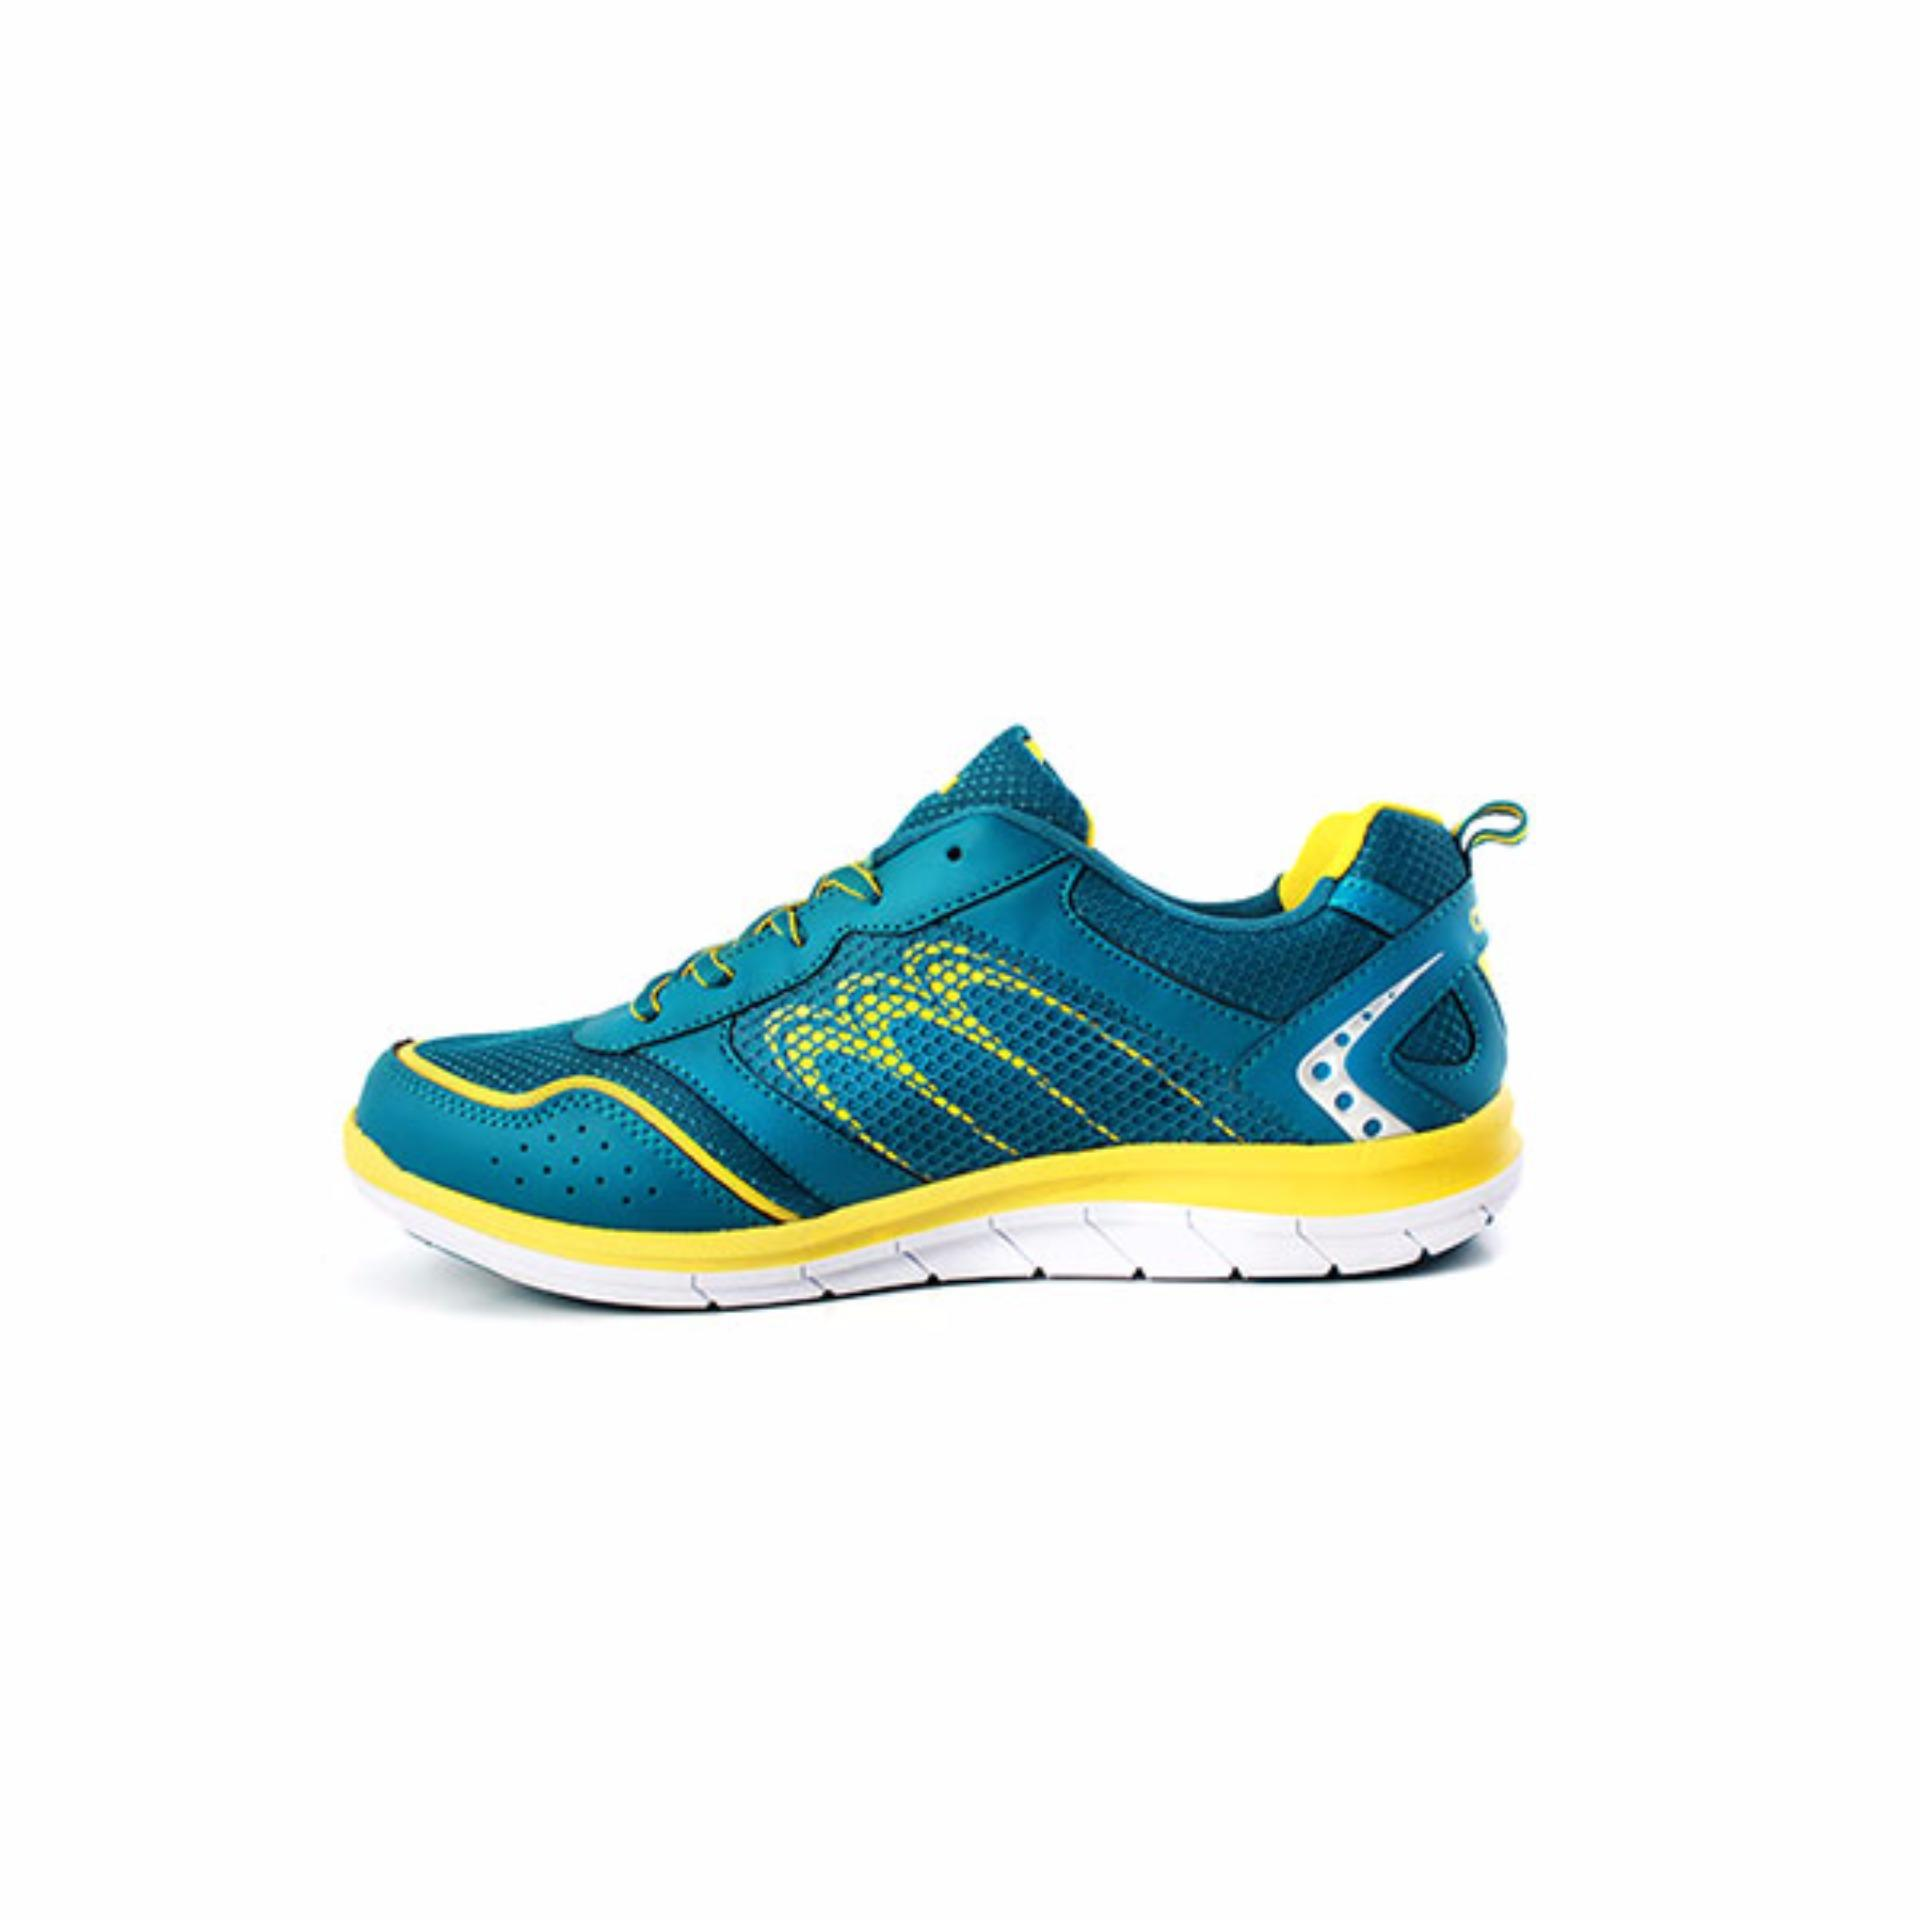 Ardiles Men Zachary Running Shoes Biru Kuning Daftar Harga Articuno Grey Black 42